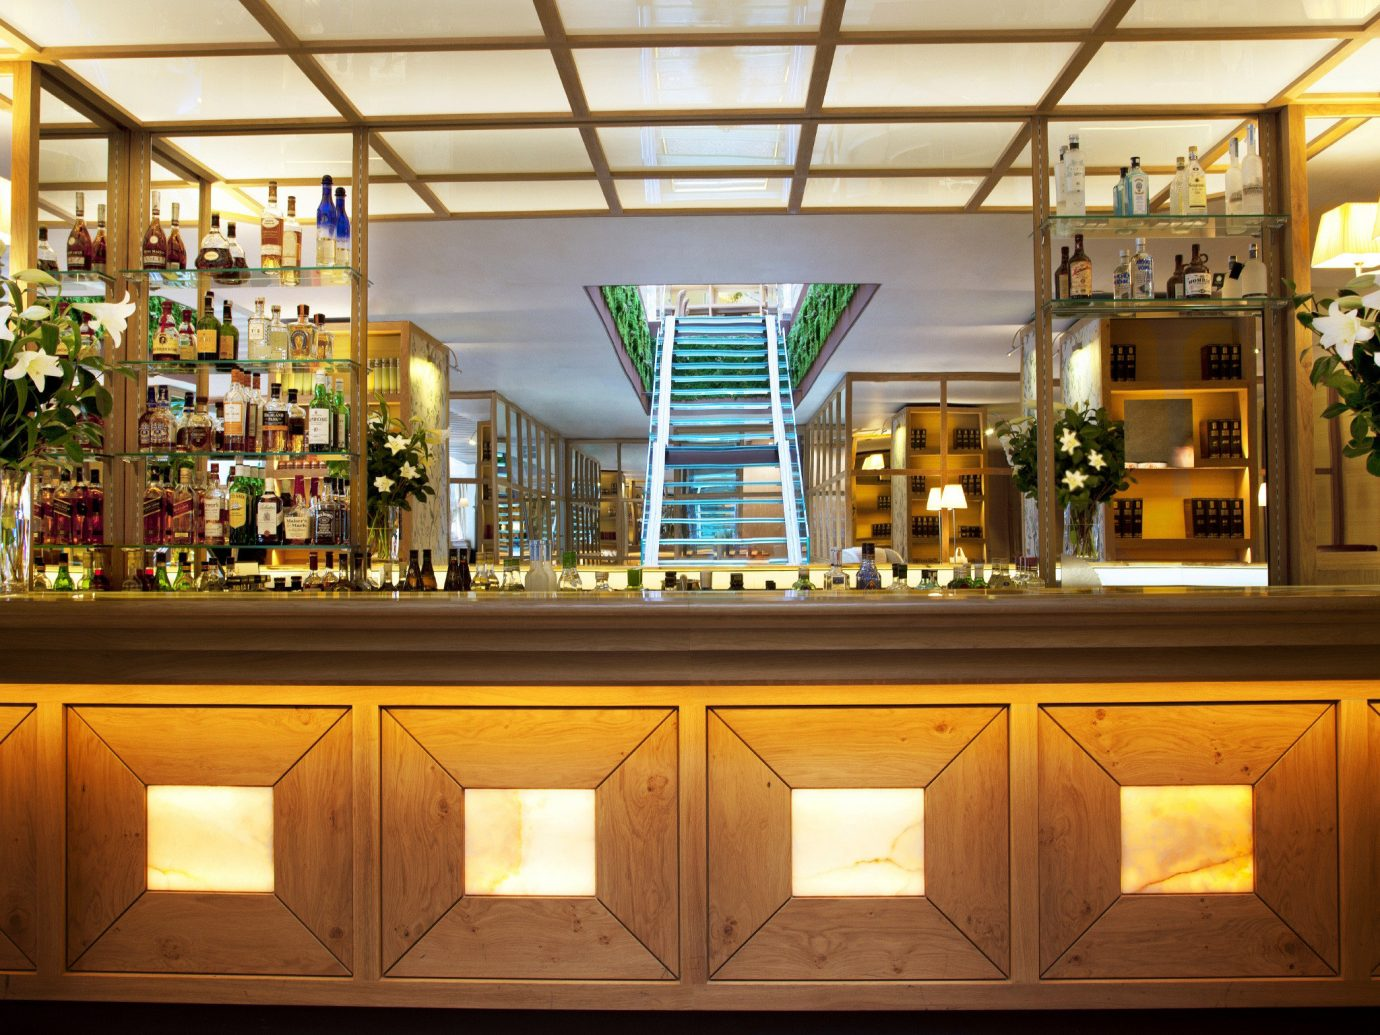 Bar Dining Eat Hip Hotels Living Lounge Luxury Madrid Modern Spain cabinet indoor ceiling retail interior design Lobby restaurant